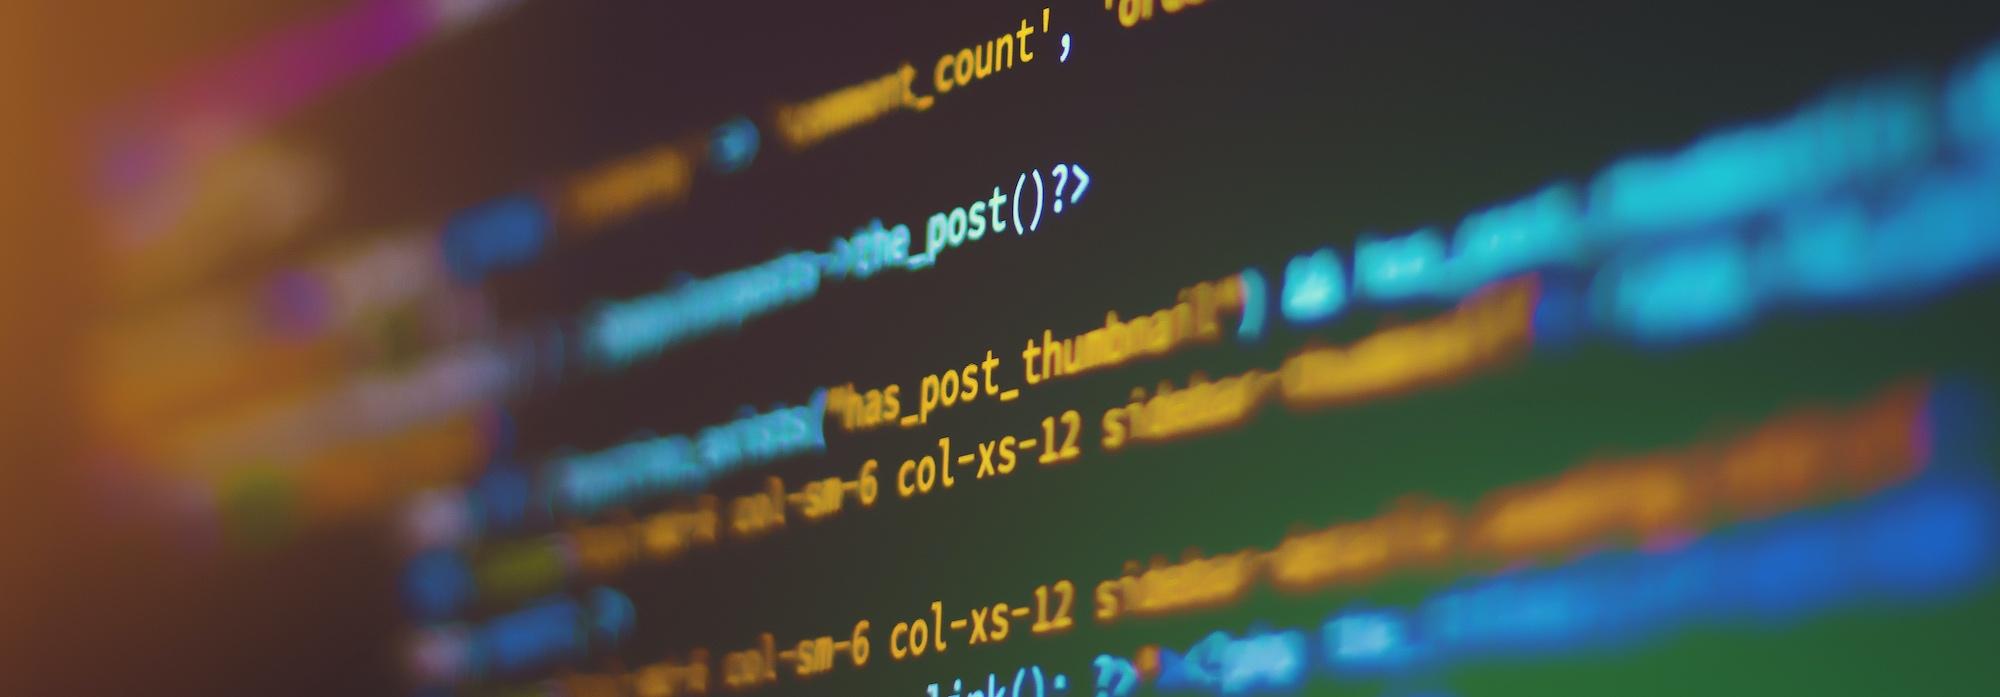 html code on a screen